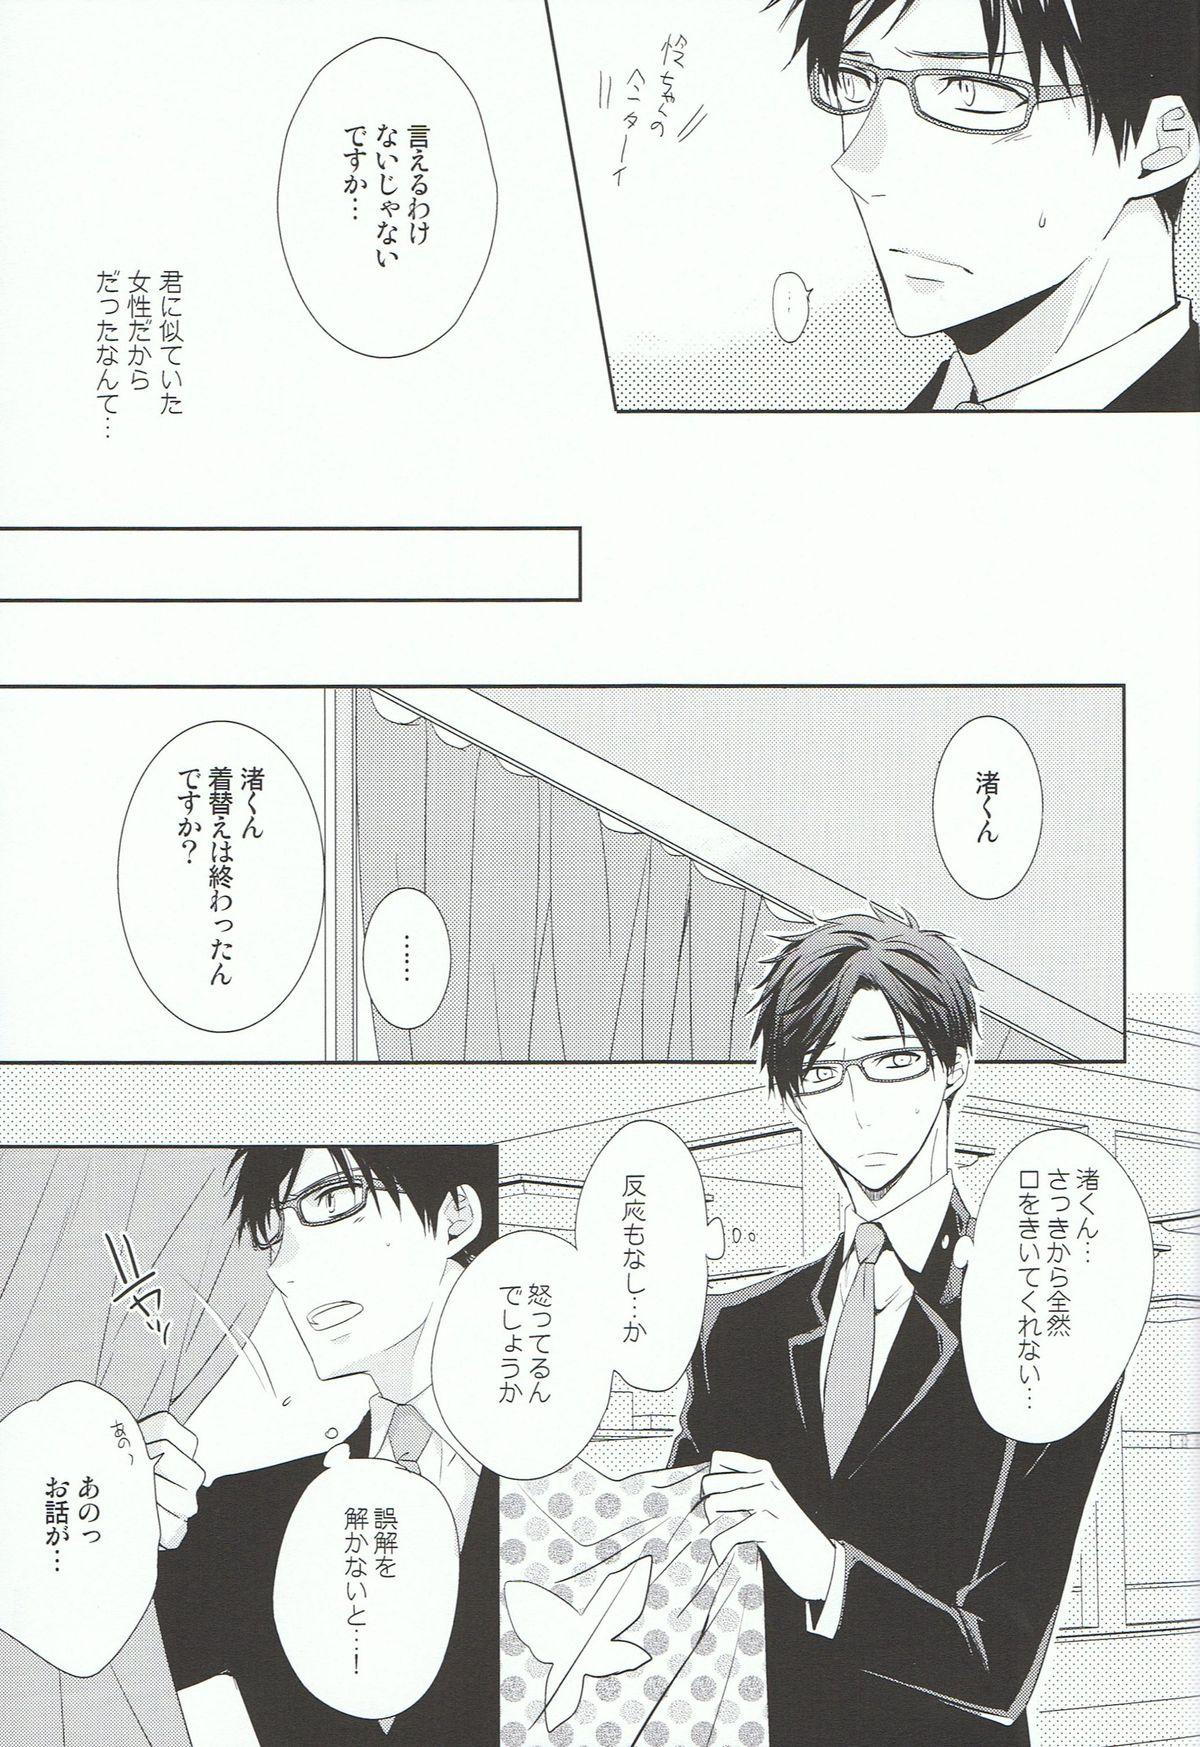 Nagisa-kun de ii deshou! 13